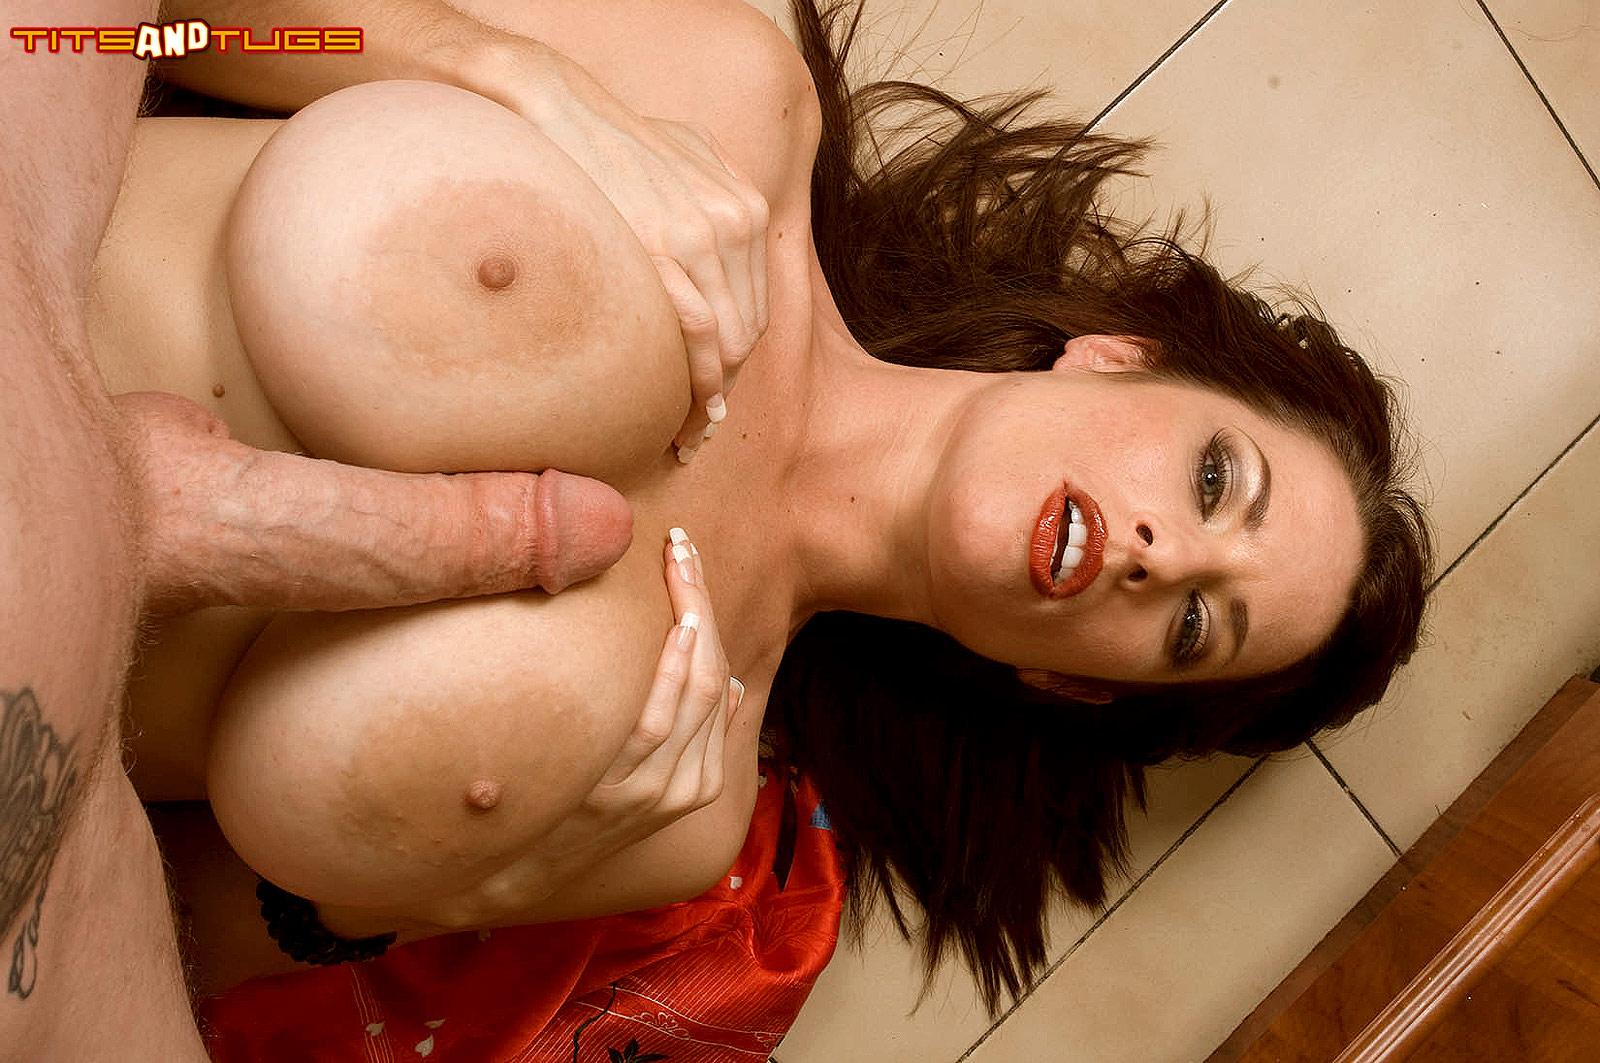 Sex with boobs porn-7768